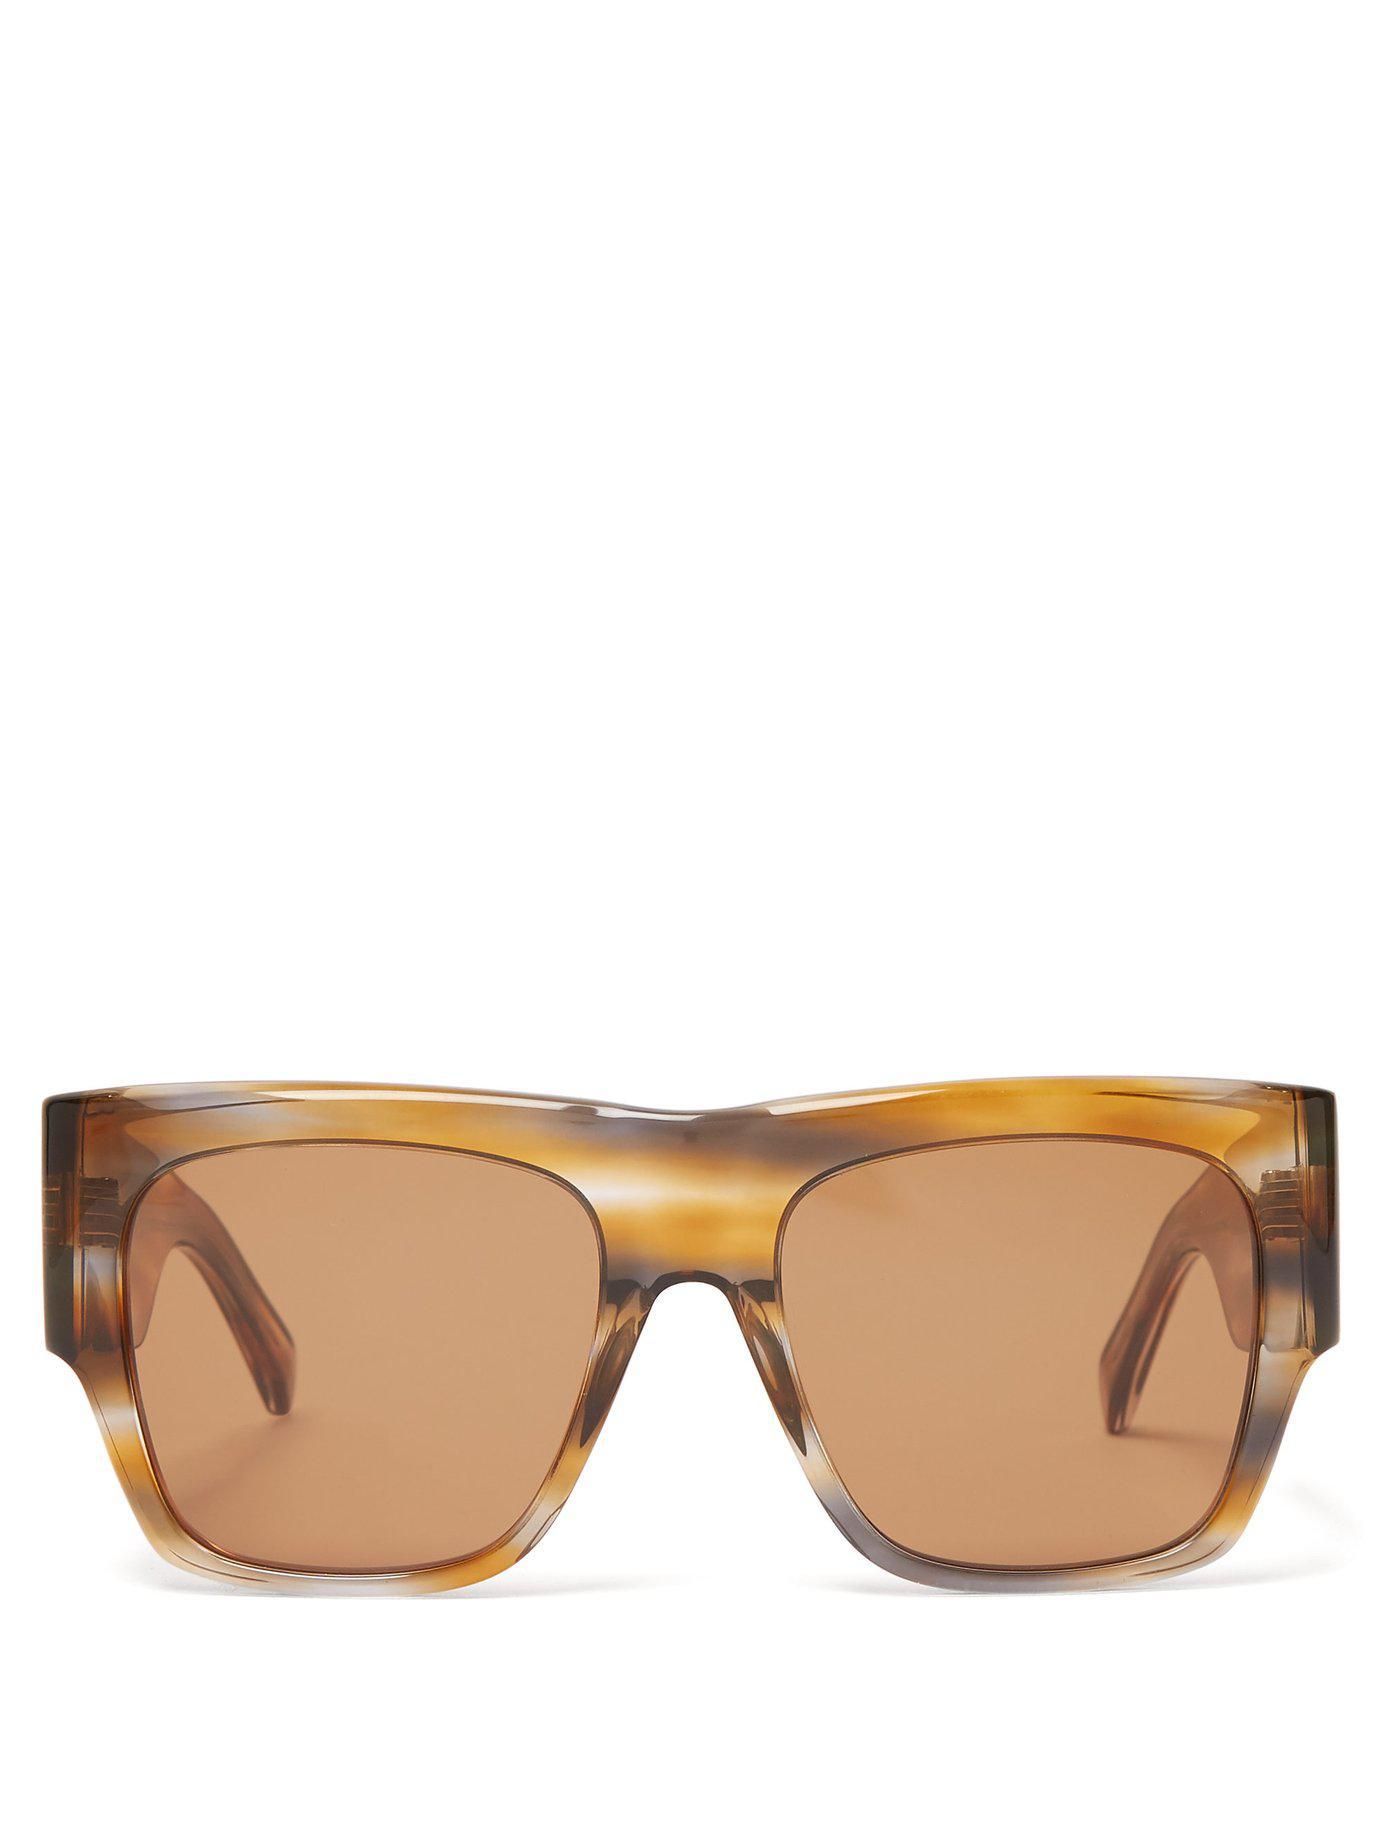 2f8d0f91d62 Céline. Women s Flat Top Acetate Sunglasses